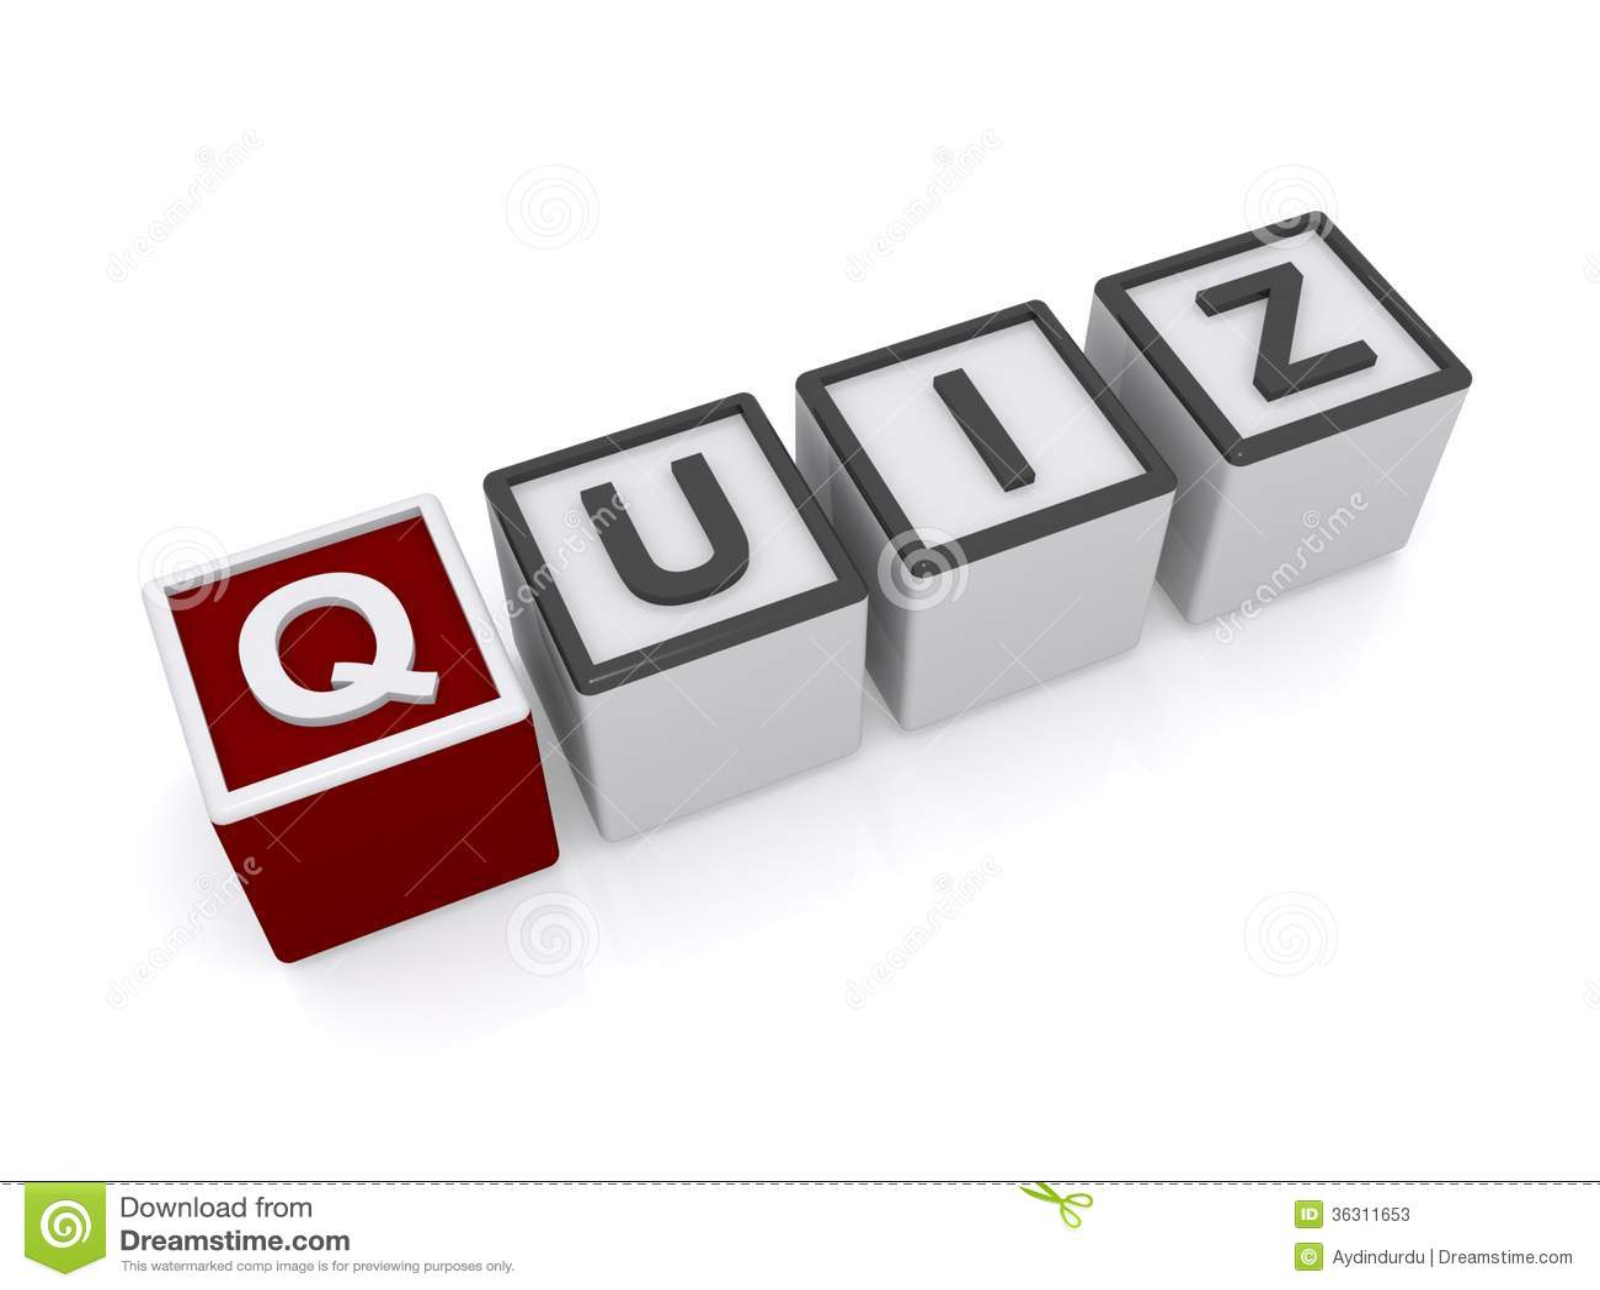 Quiz sign stock illustration  Illustration of letters - 36311653